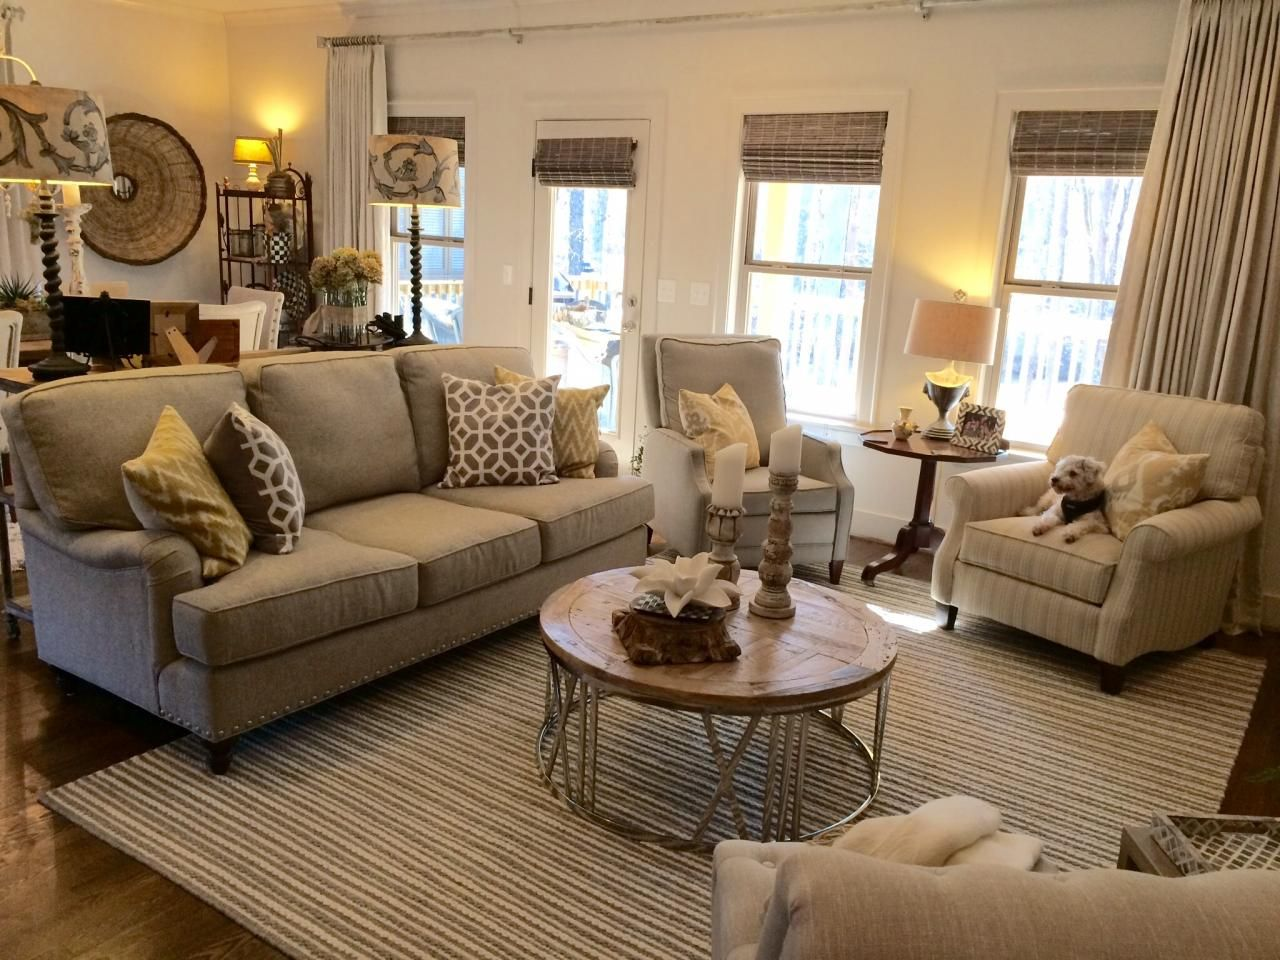 barnett furniture customer orders king hickory chatham sofa comfort design frost recliner